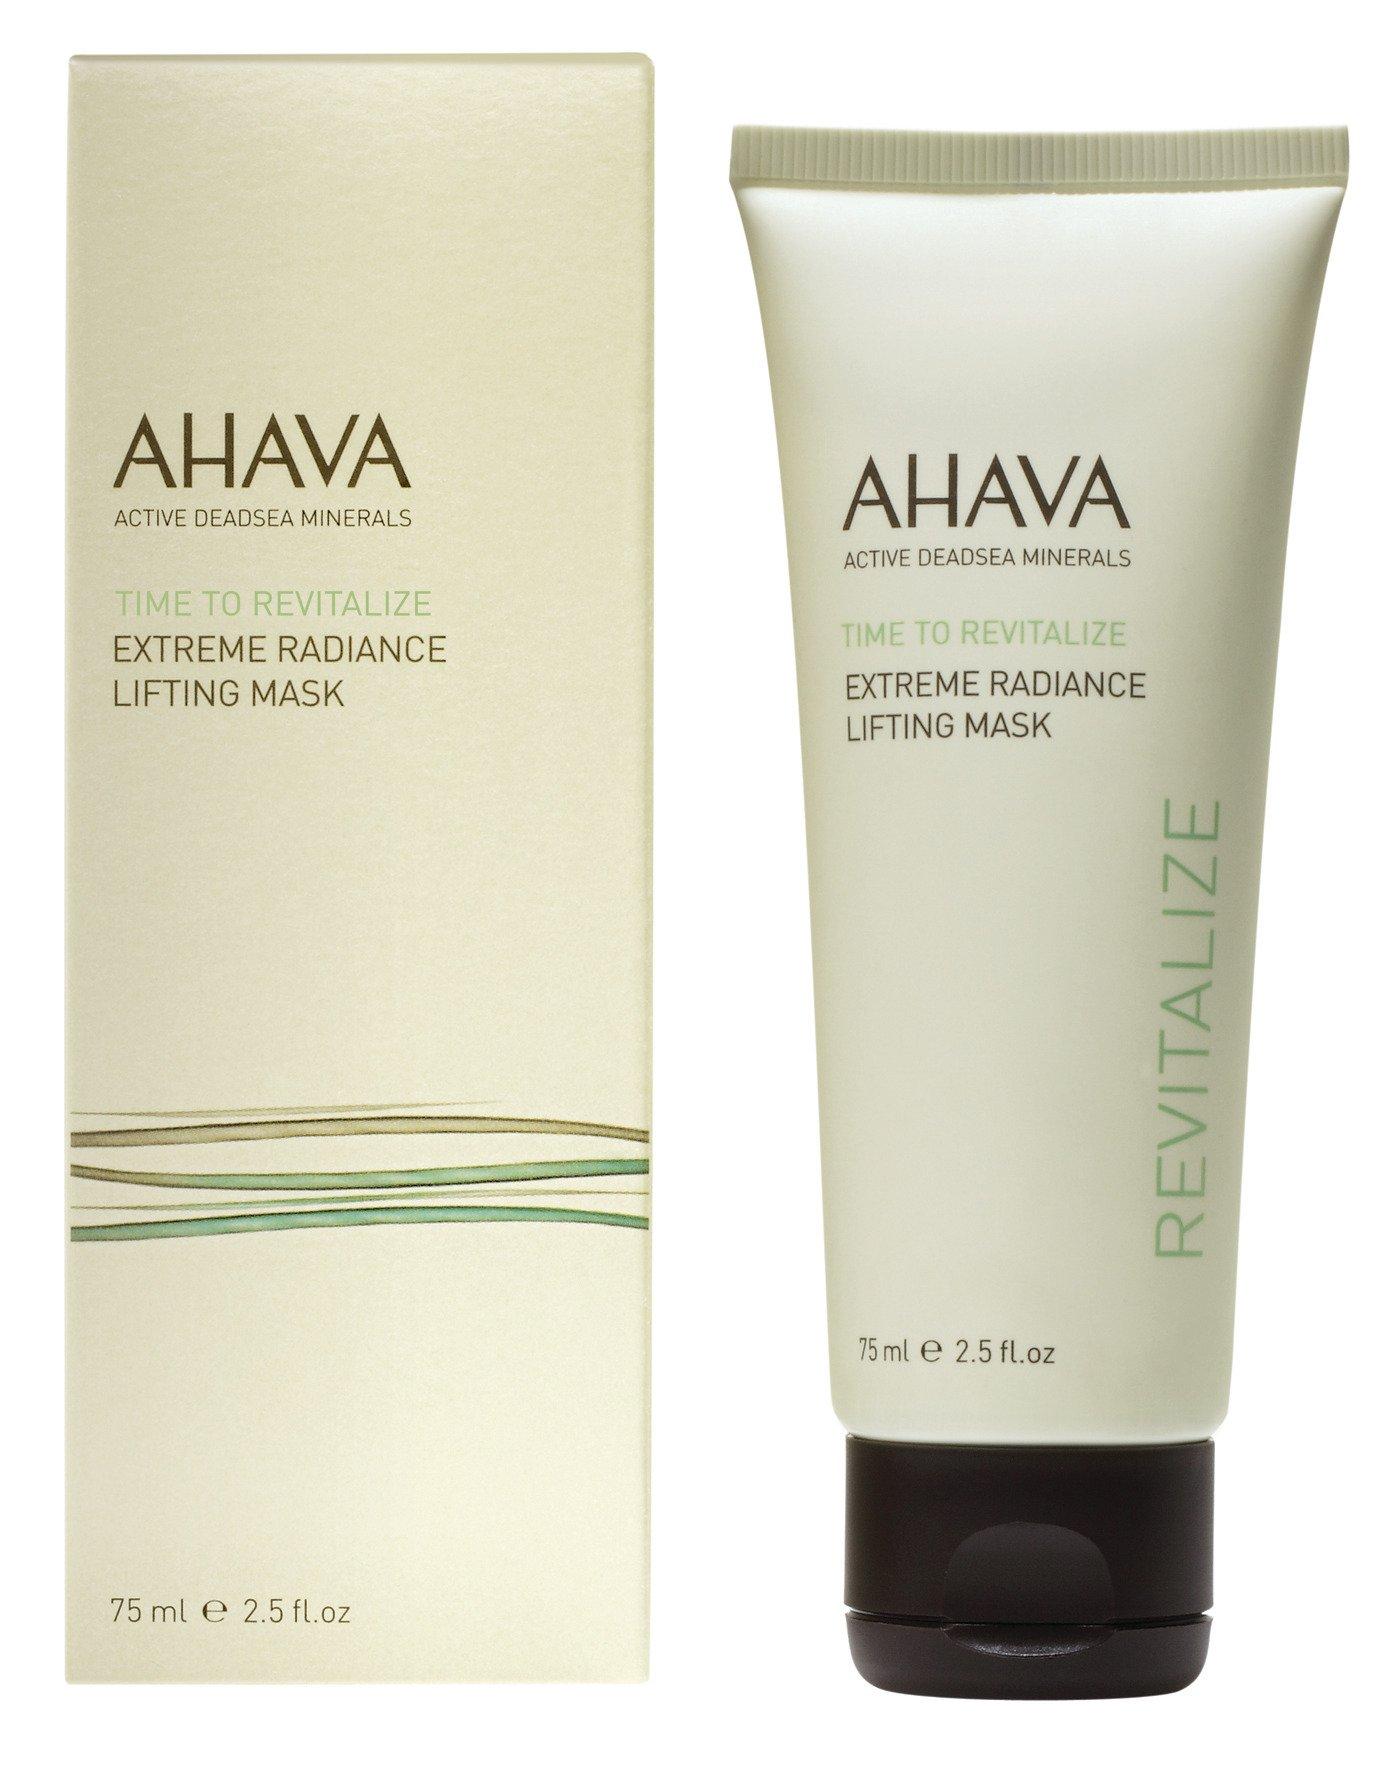 AHAVA Time to Revitalize Extreme Radiance Lifting Mask, 2.5 fl. oz.